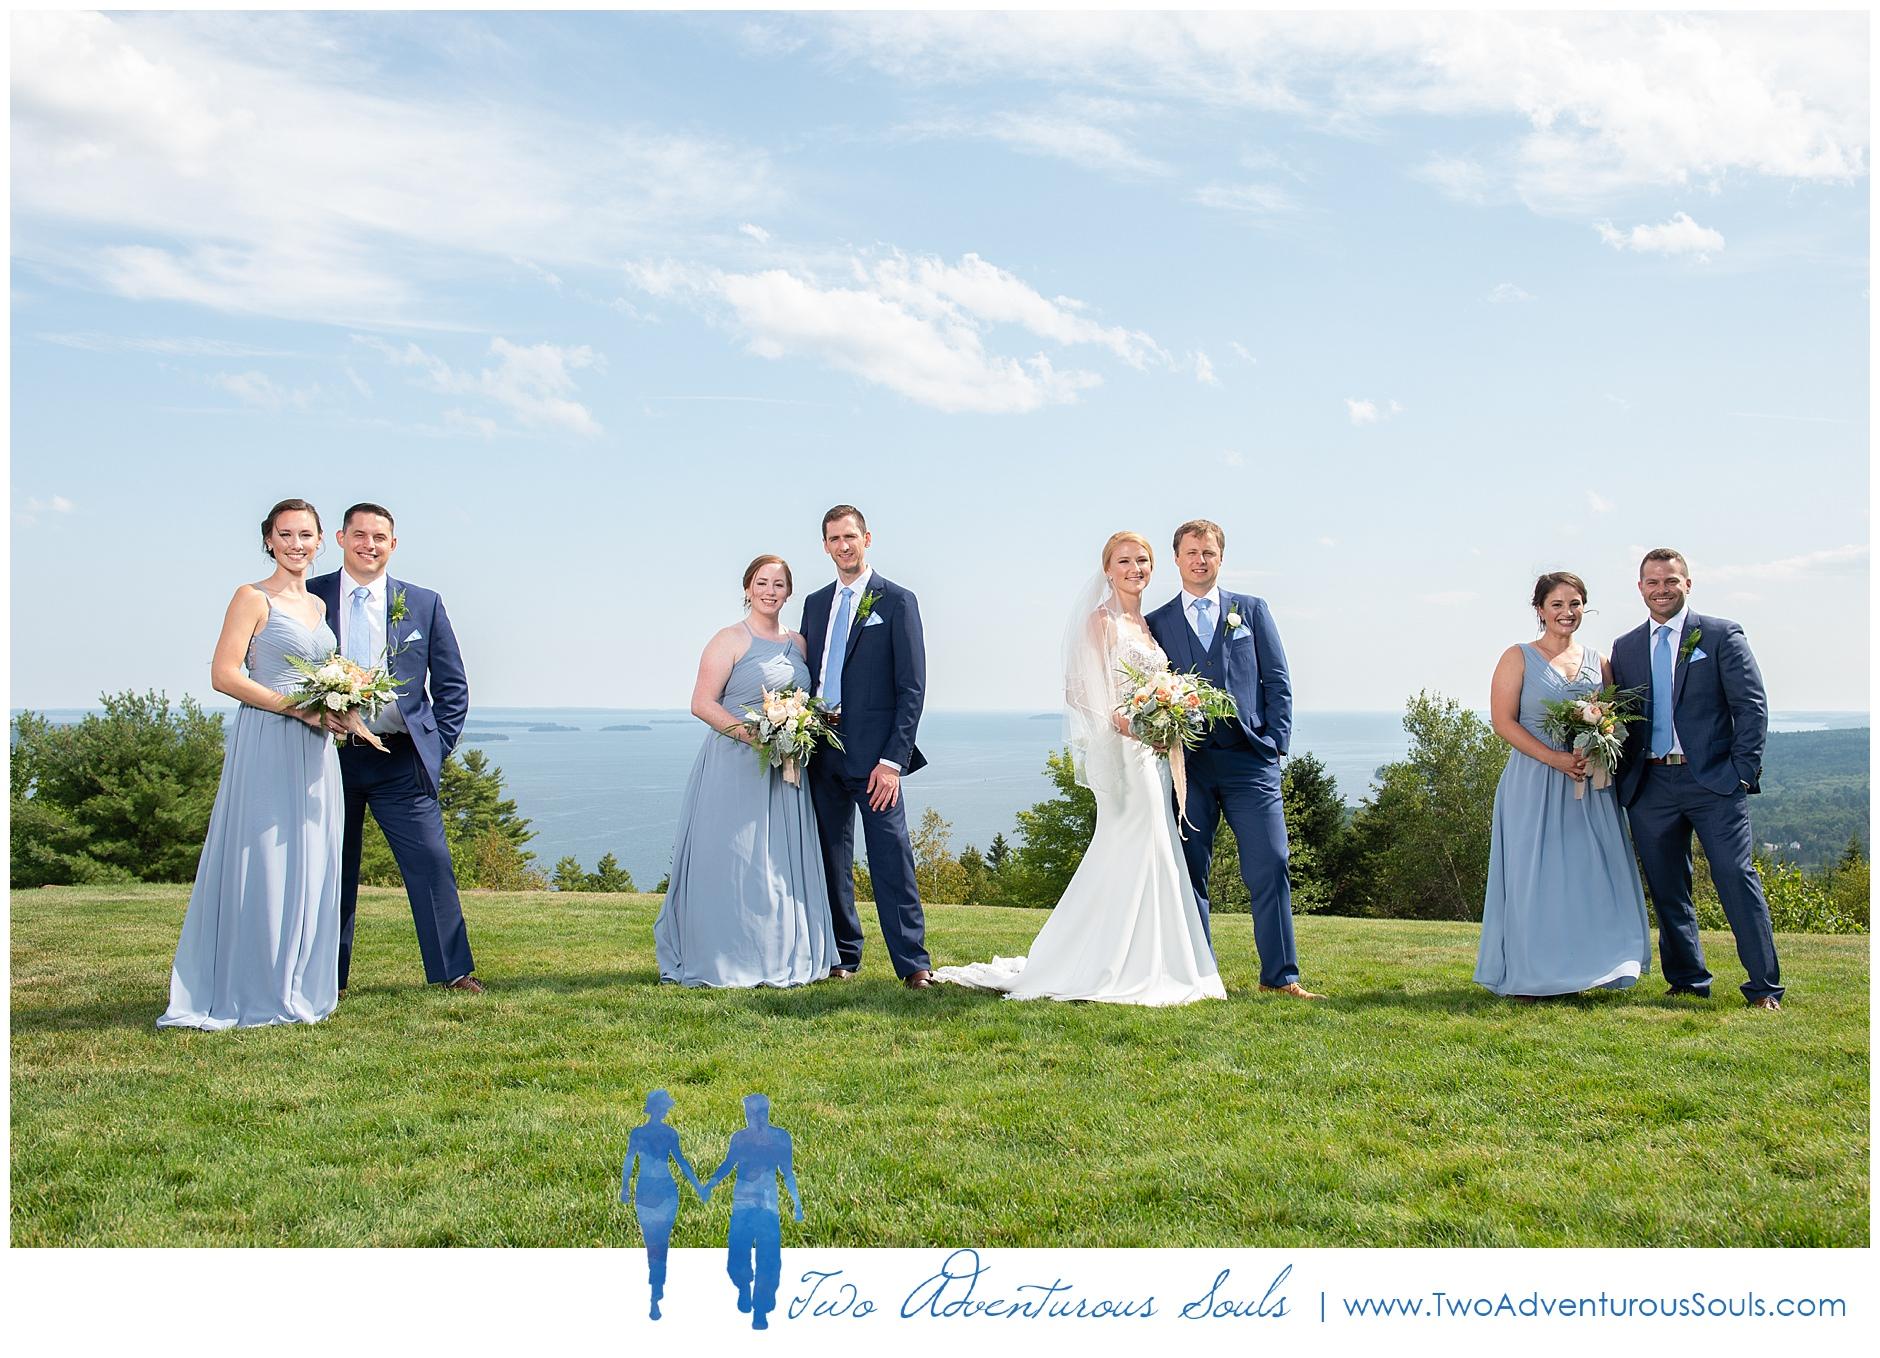 Maine Wedding Photographers, Point Lookout Wedding Photographers, Maine Elopement Photographers, Two Adventurous Souls-0080419_0029.jpg